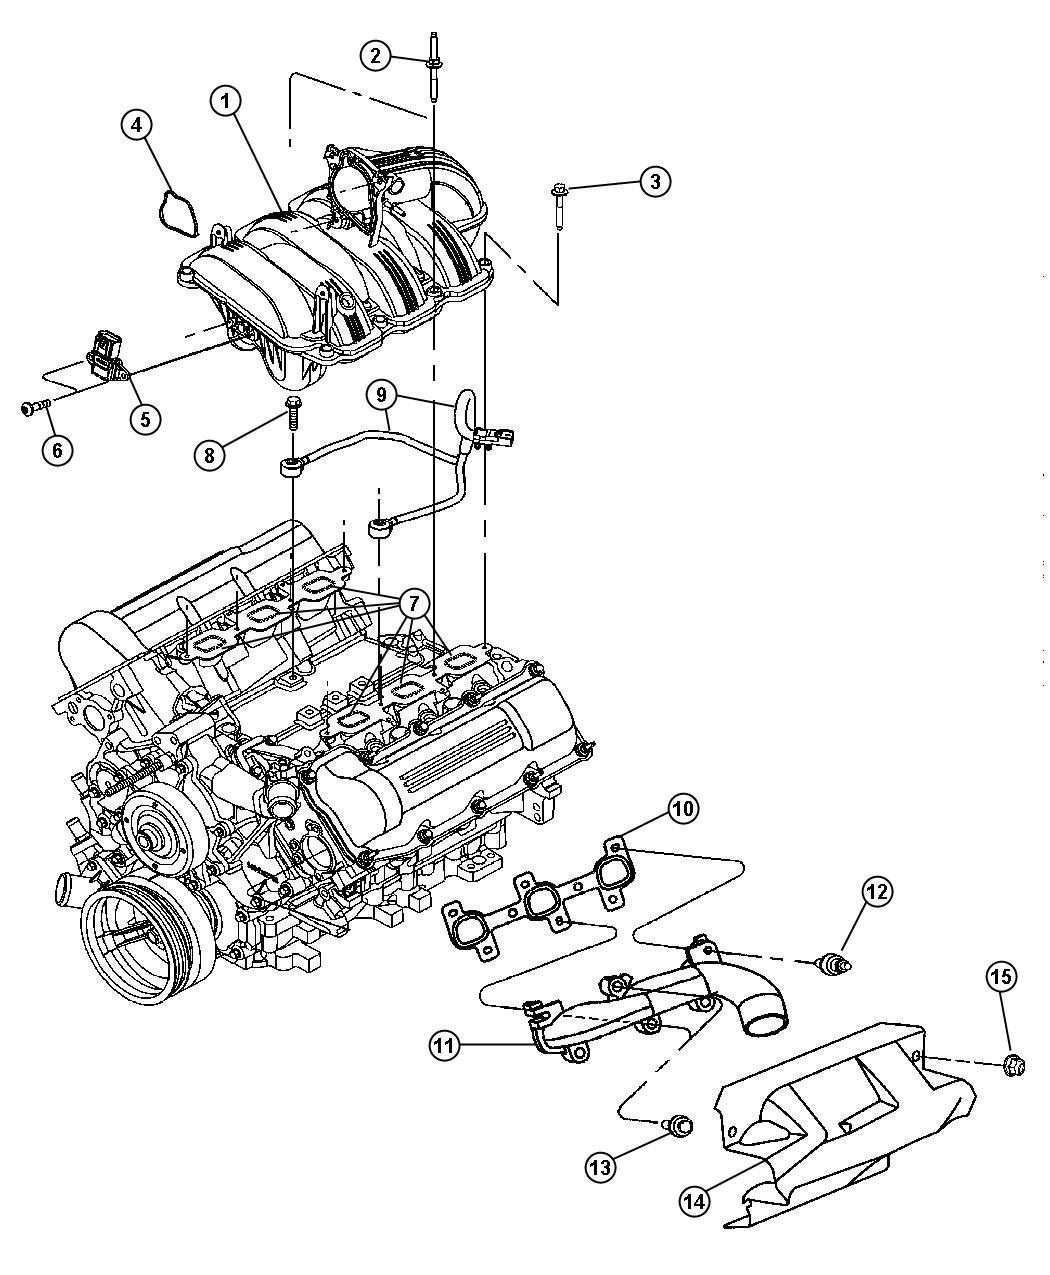 2013 Chrysler 200 Gasket  Throttle Body To Intake  Evaevd